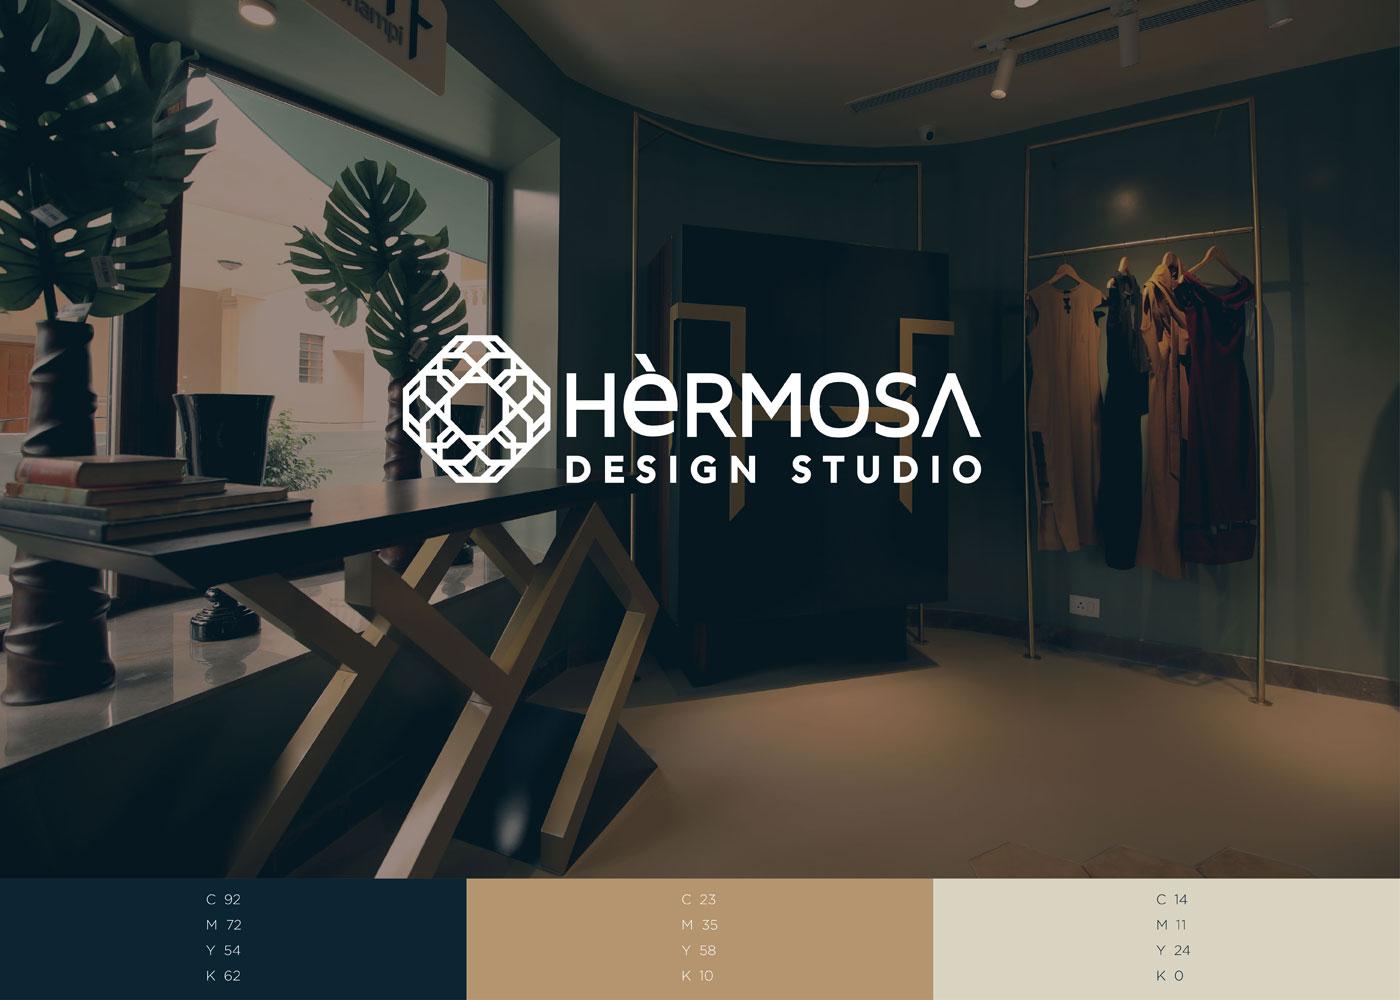 Hermosa-New-01